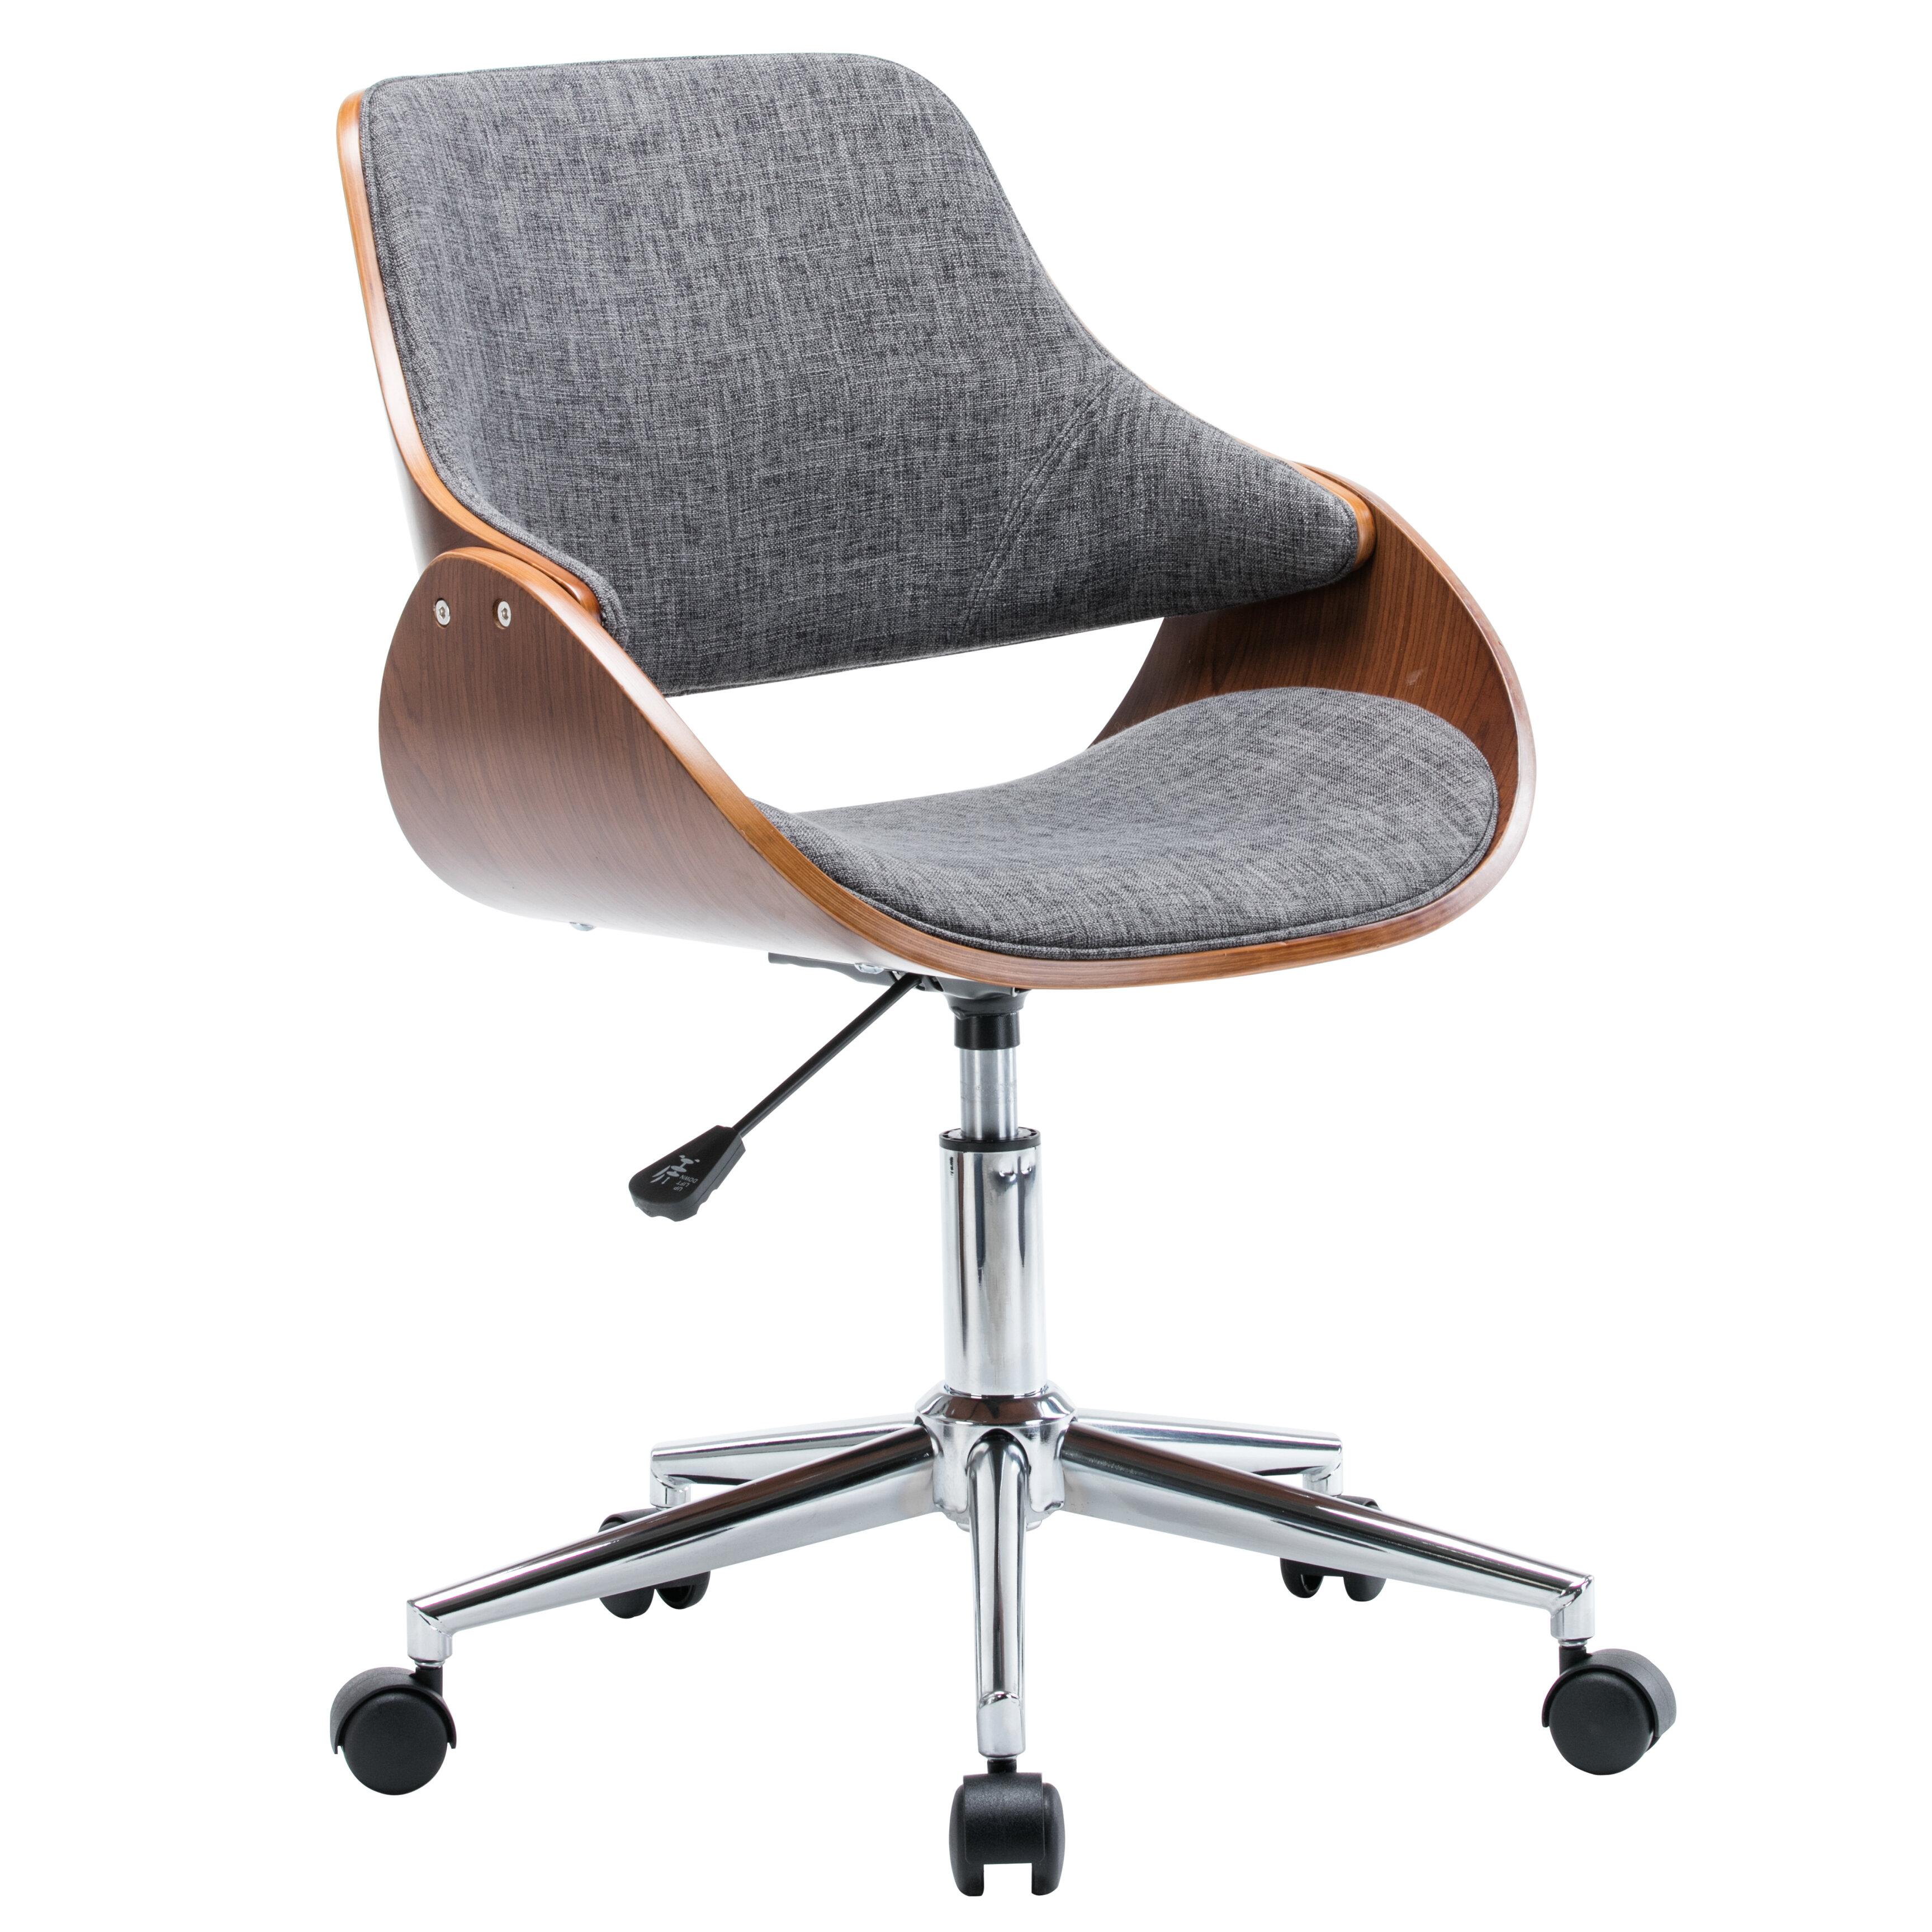 Brilliant George Oliver Dimatteo Task Chair Reviews Wayfair Unemploymentrelief Wooden Chair Designs For Living Room Unemploymentrelieforg